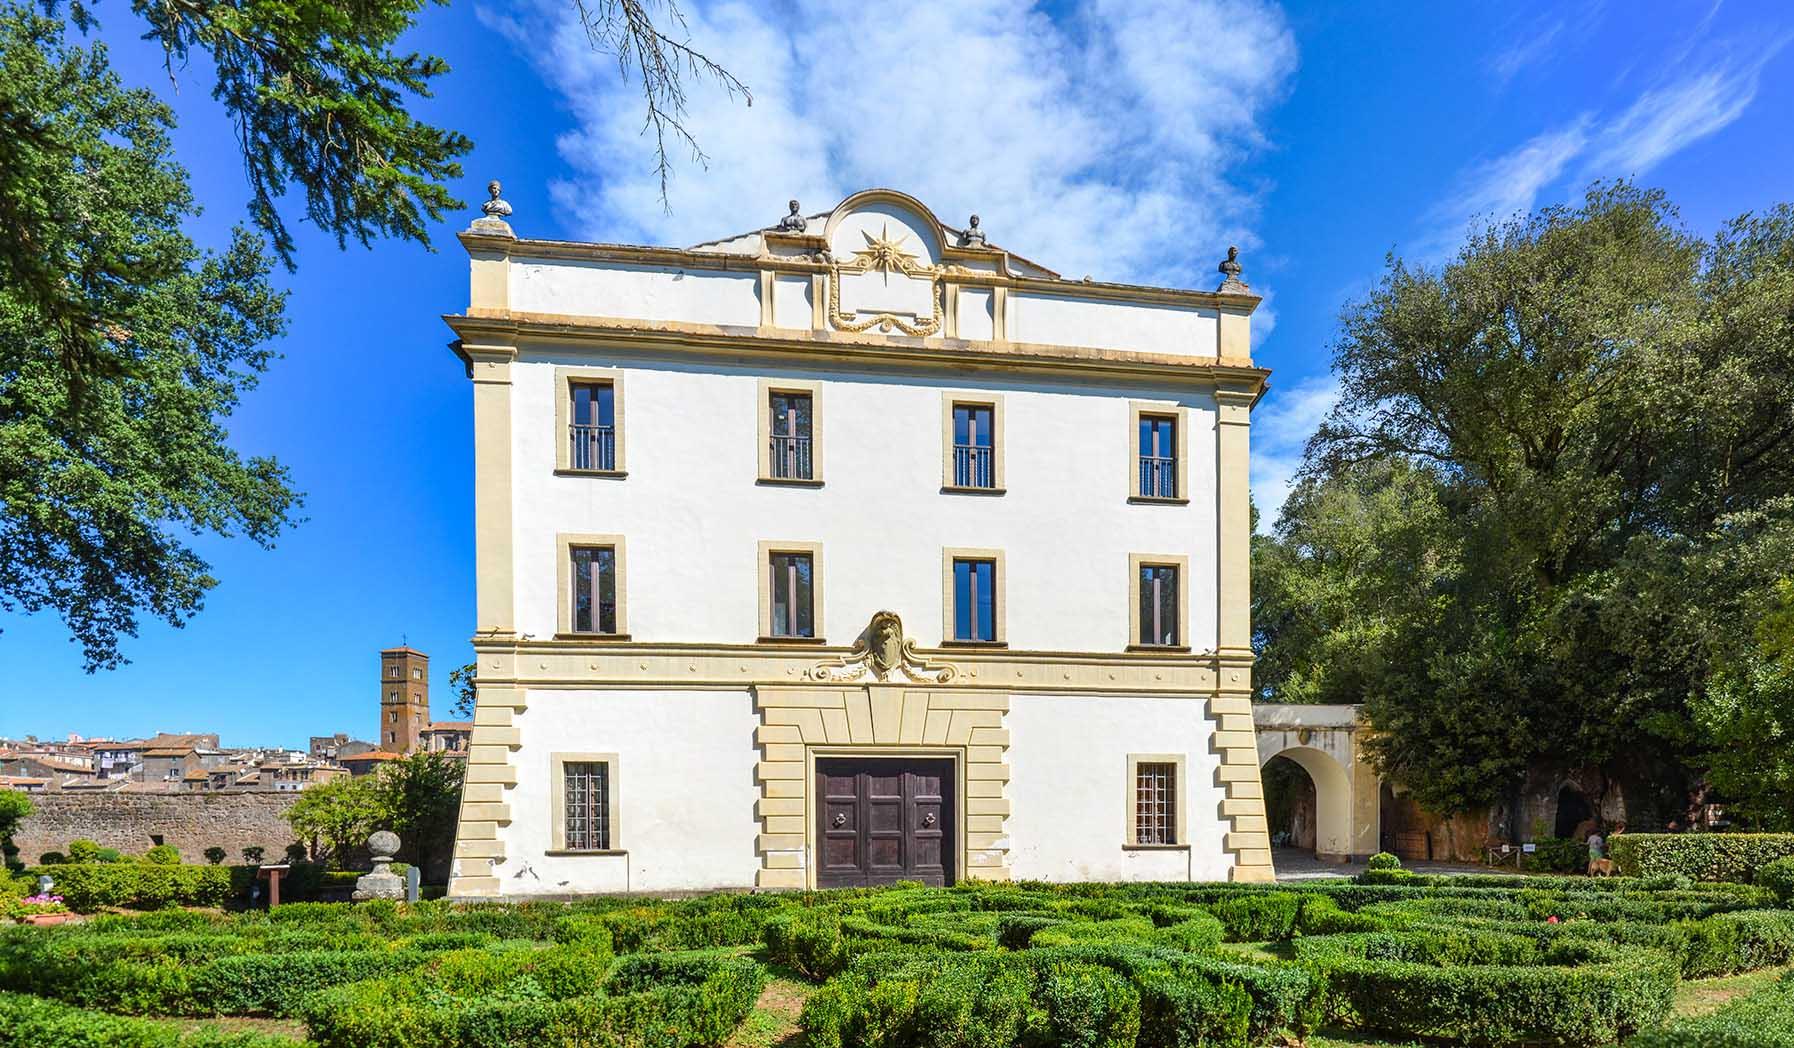 Palazzo Savorelli